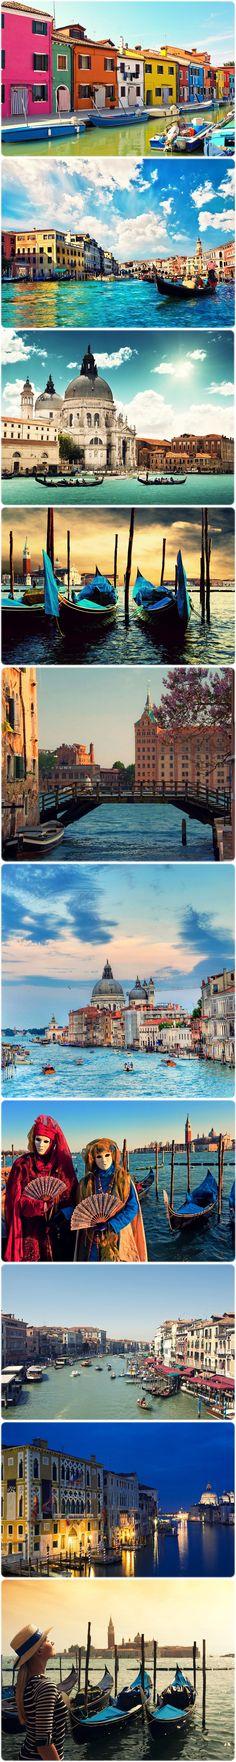 Venice, Italy ♡♡ So beautiful Ailleurs communication…